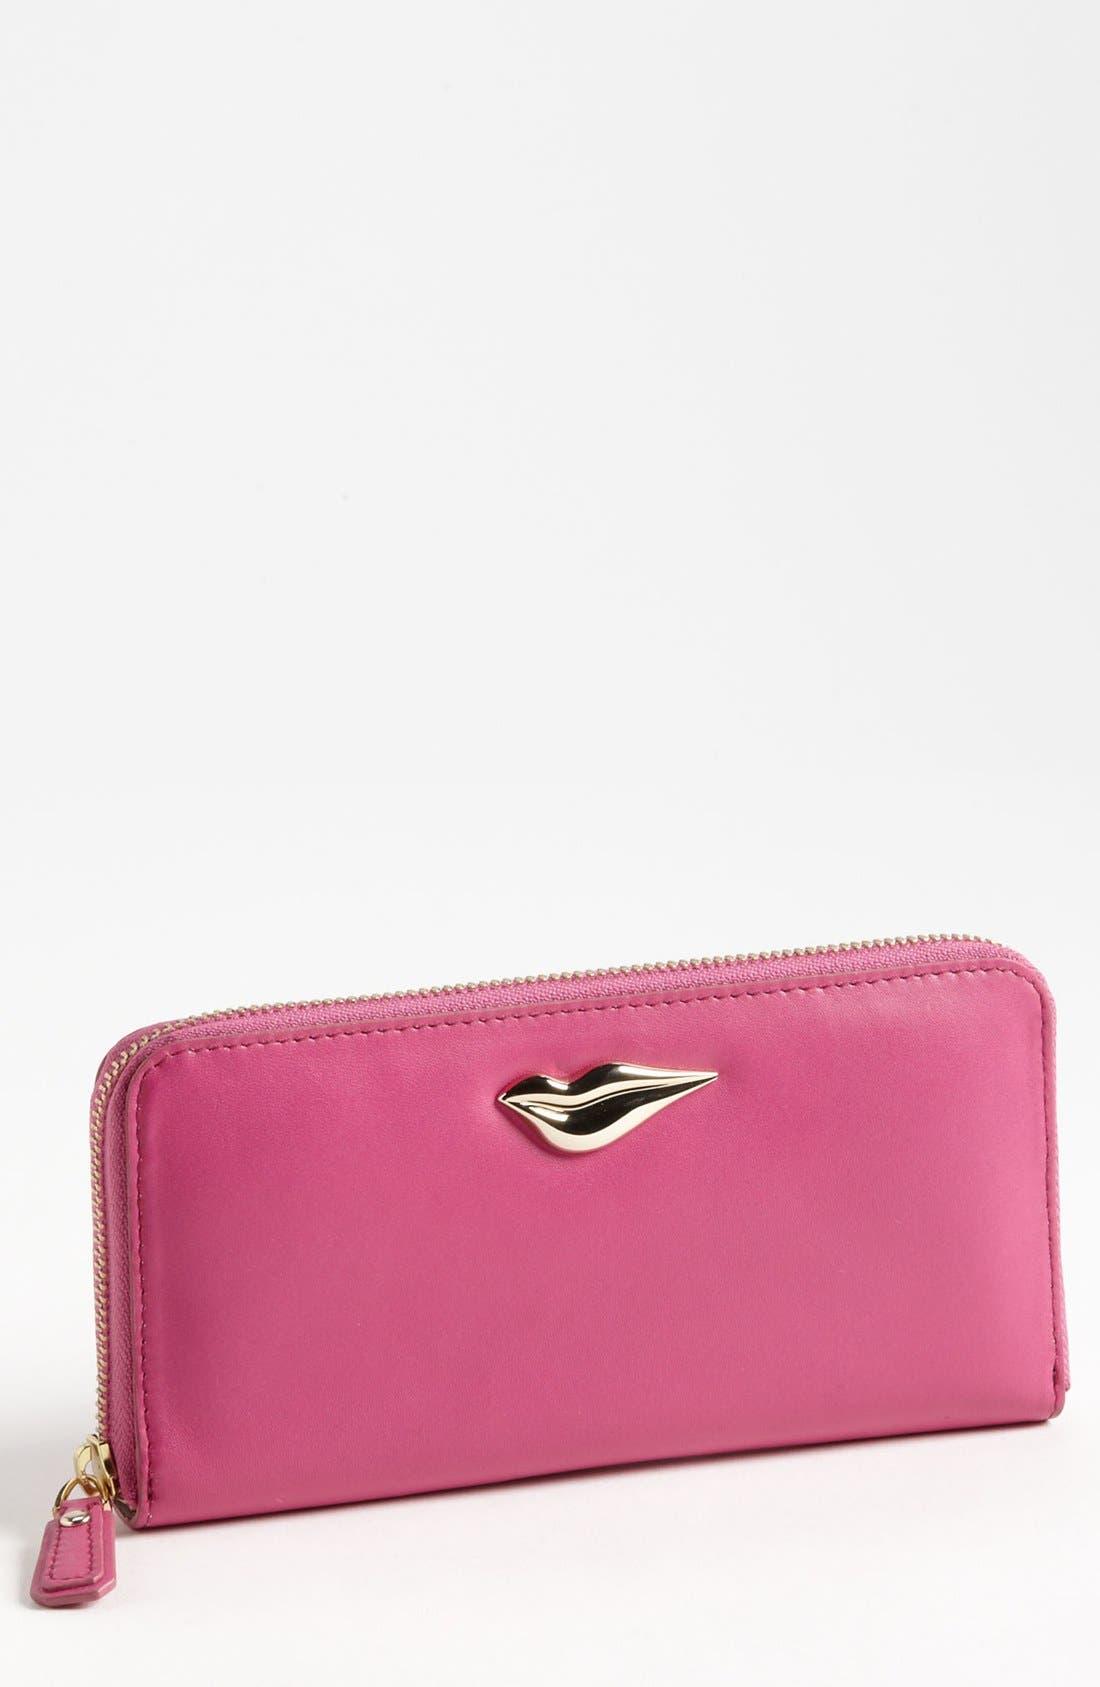 Alternate Image 1 Selected - Diane von Furstenberg 'Lips' Leather Wallet